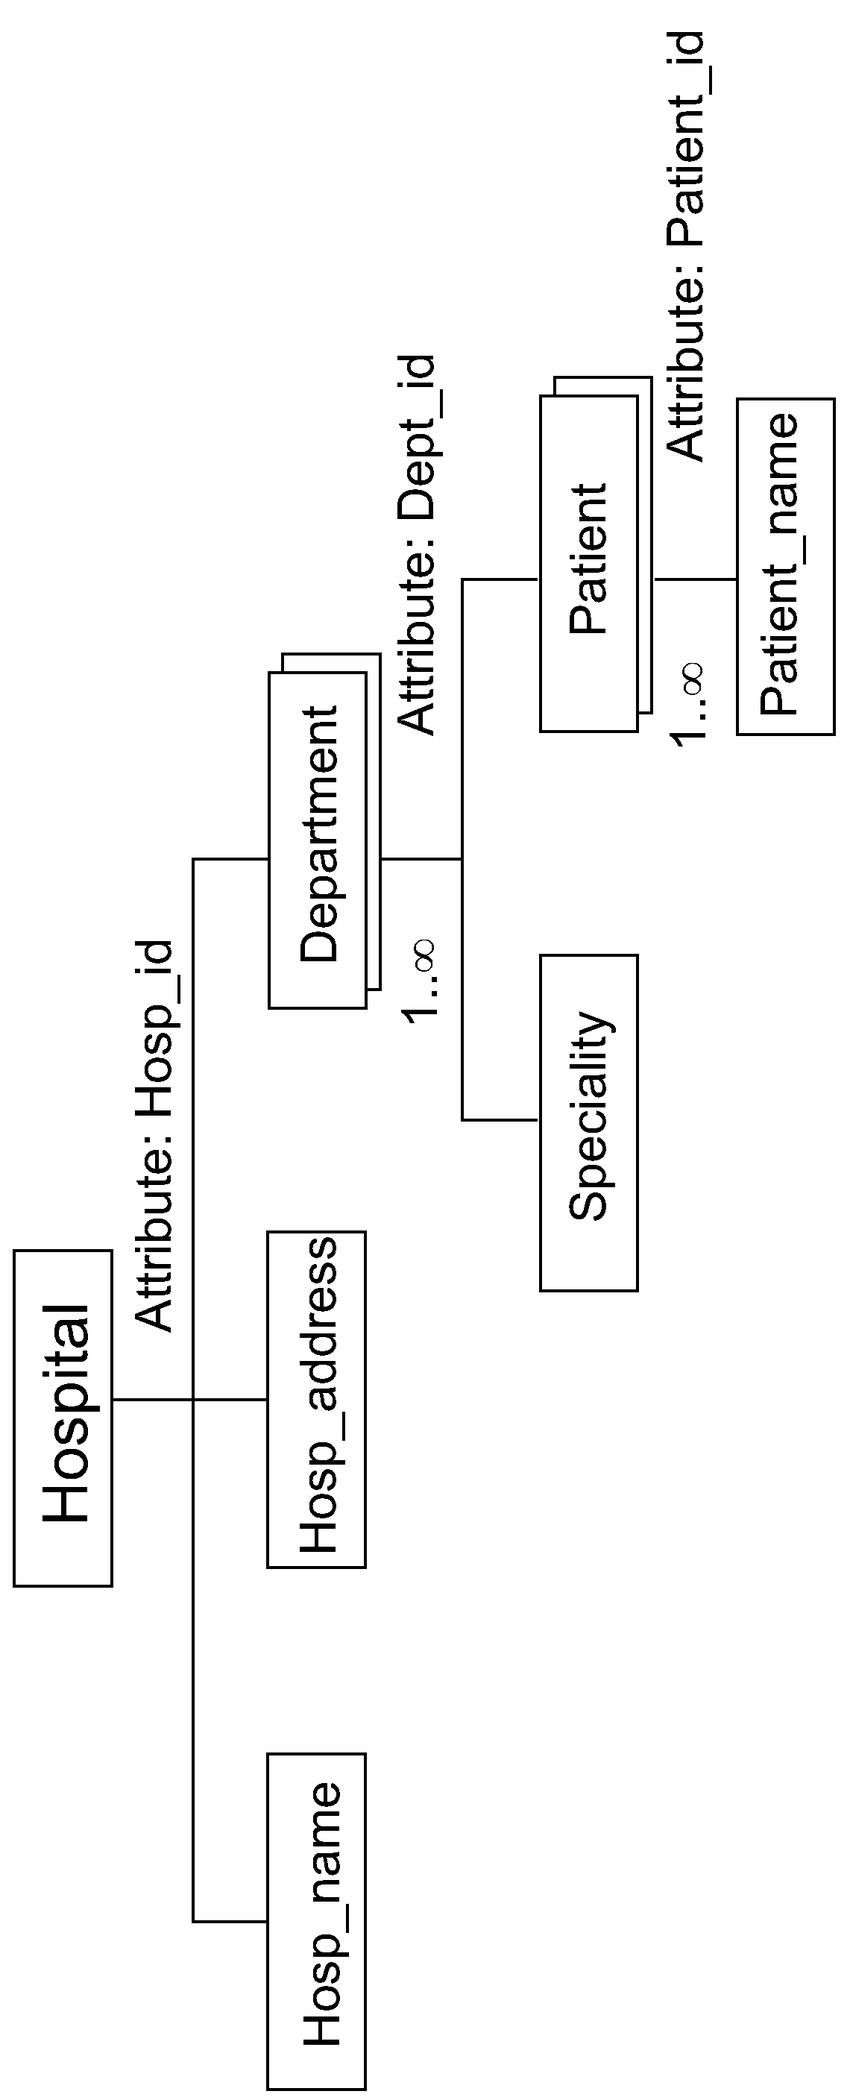 Example Of Xml Schema | Download Scientific Diagram throughout Er Diagram To Xml Schema Example